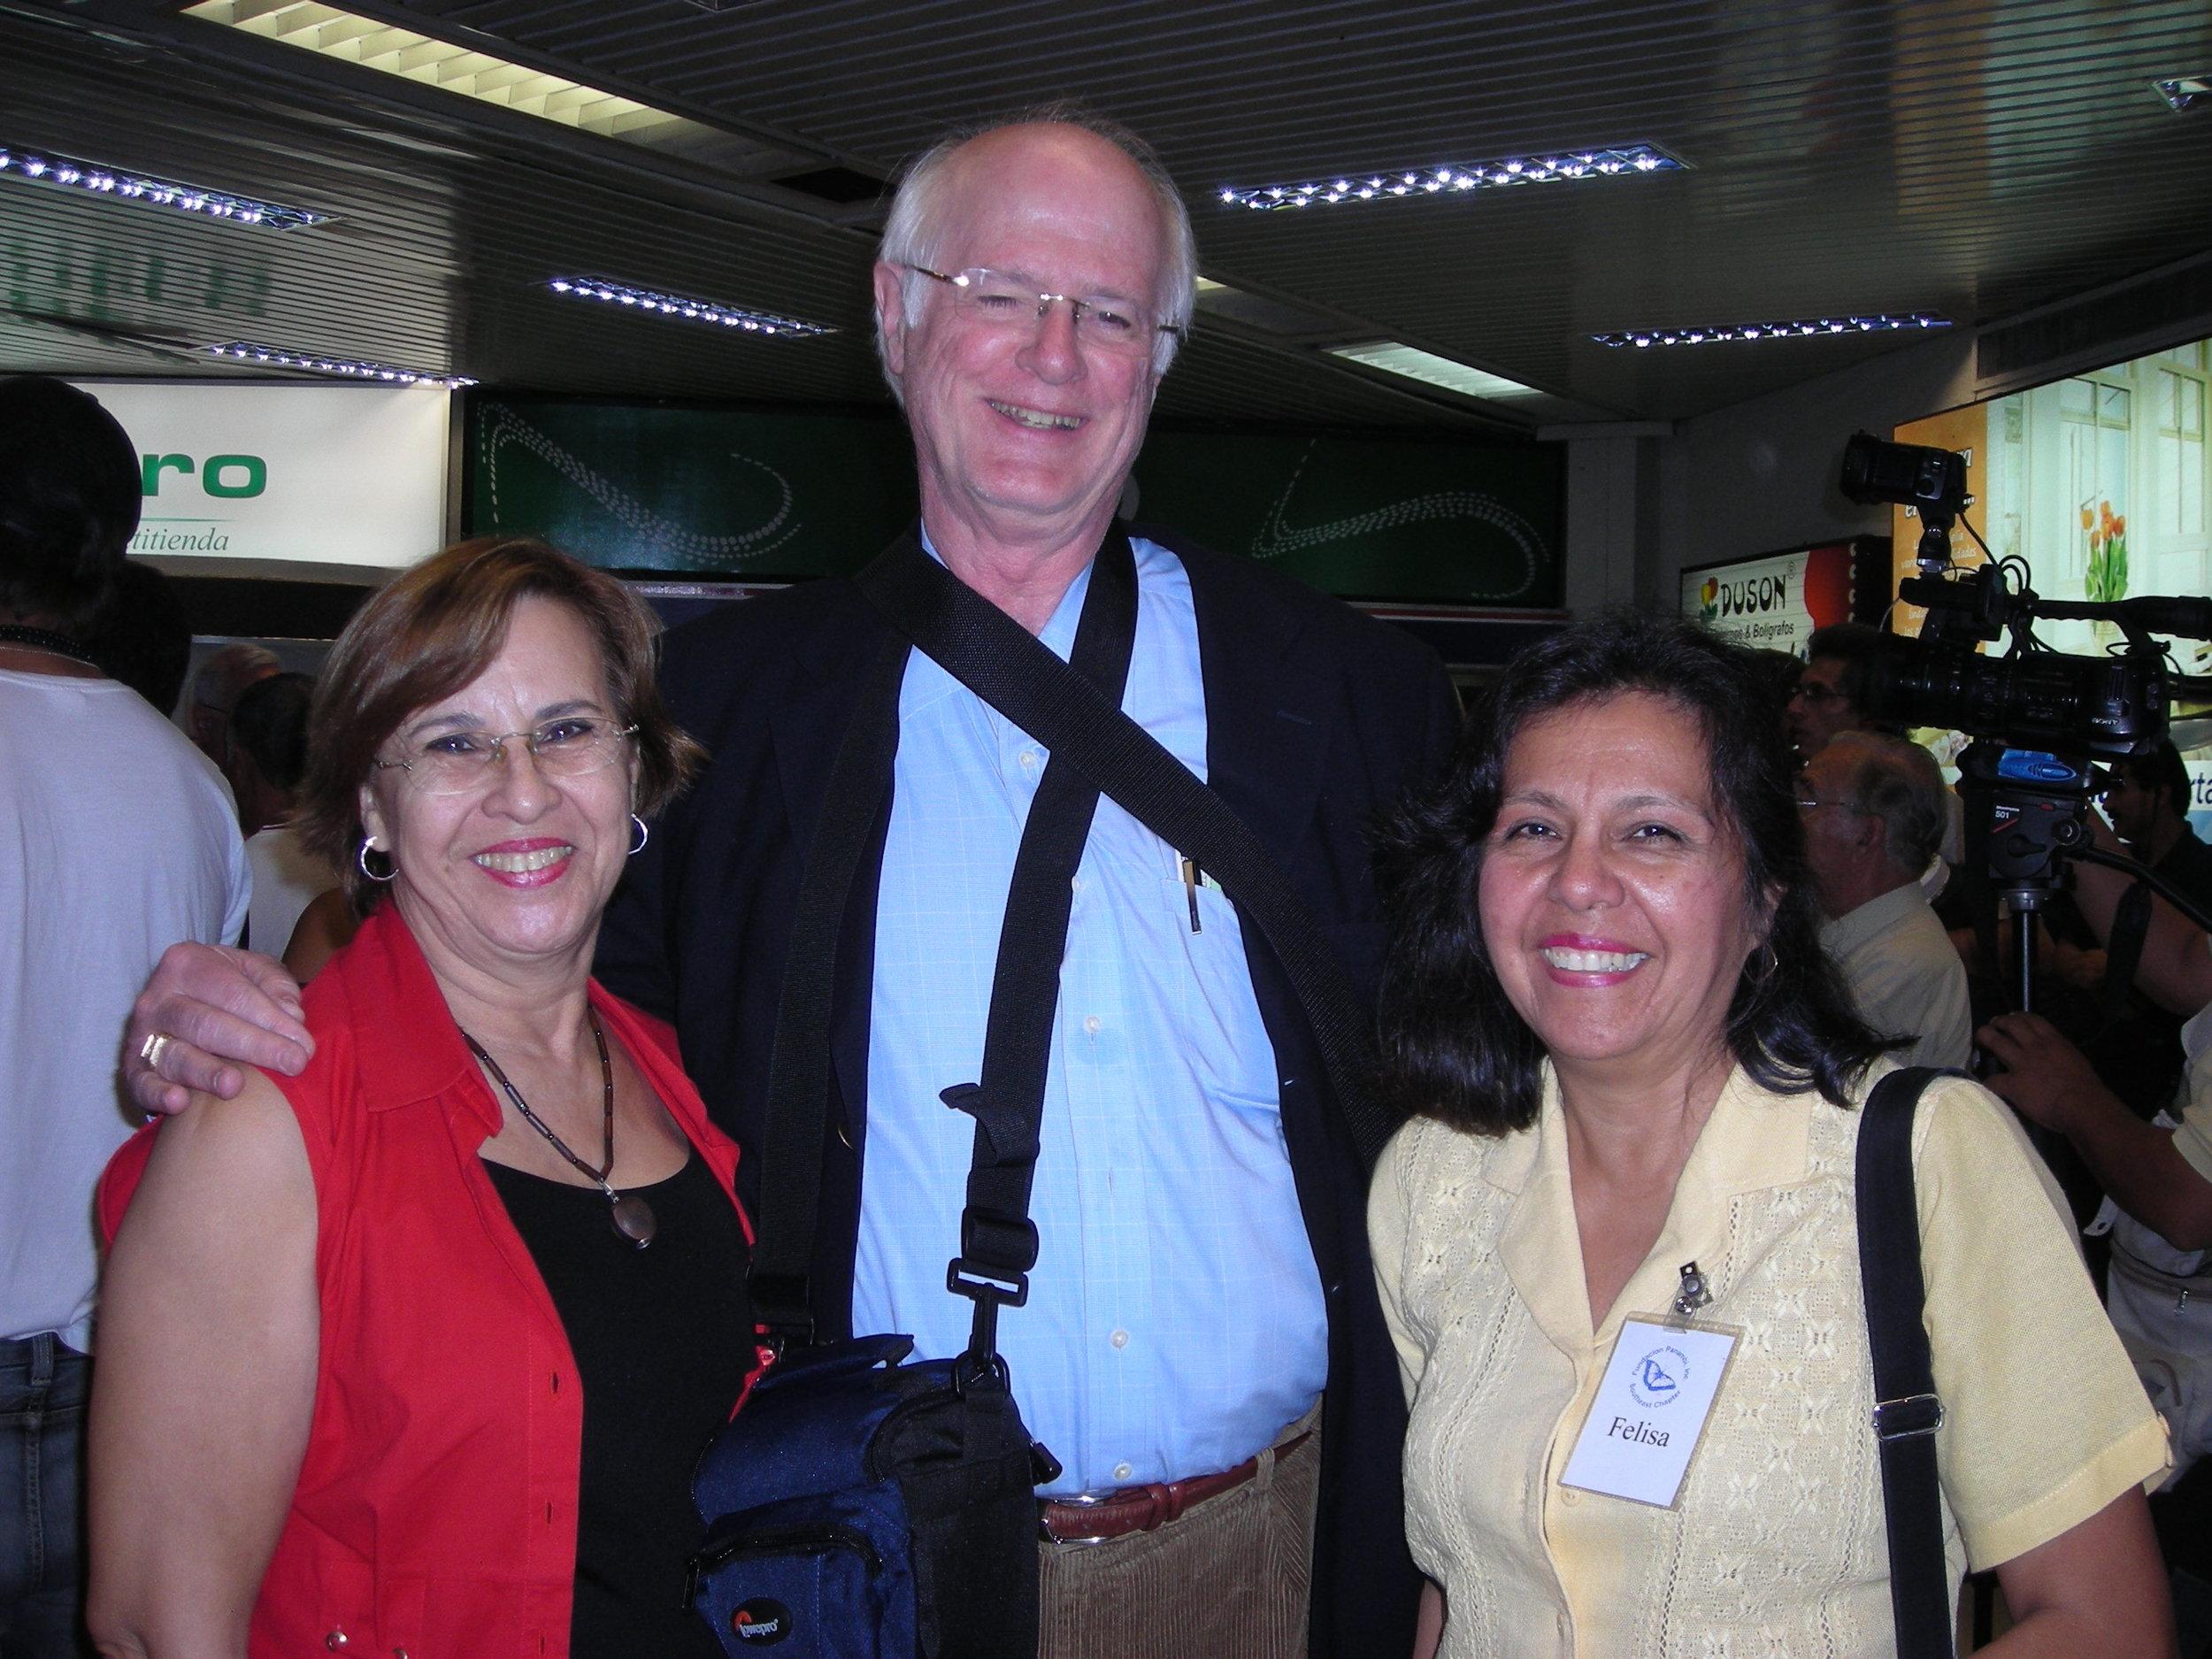 Ms. Oliva Riva, hostess to Project C.U.R.E. volunteer Mr. Raymond White and Fundacion Panambi volunteer, Mrs. Felisa De Kler